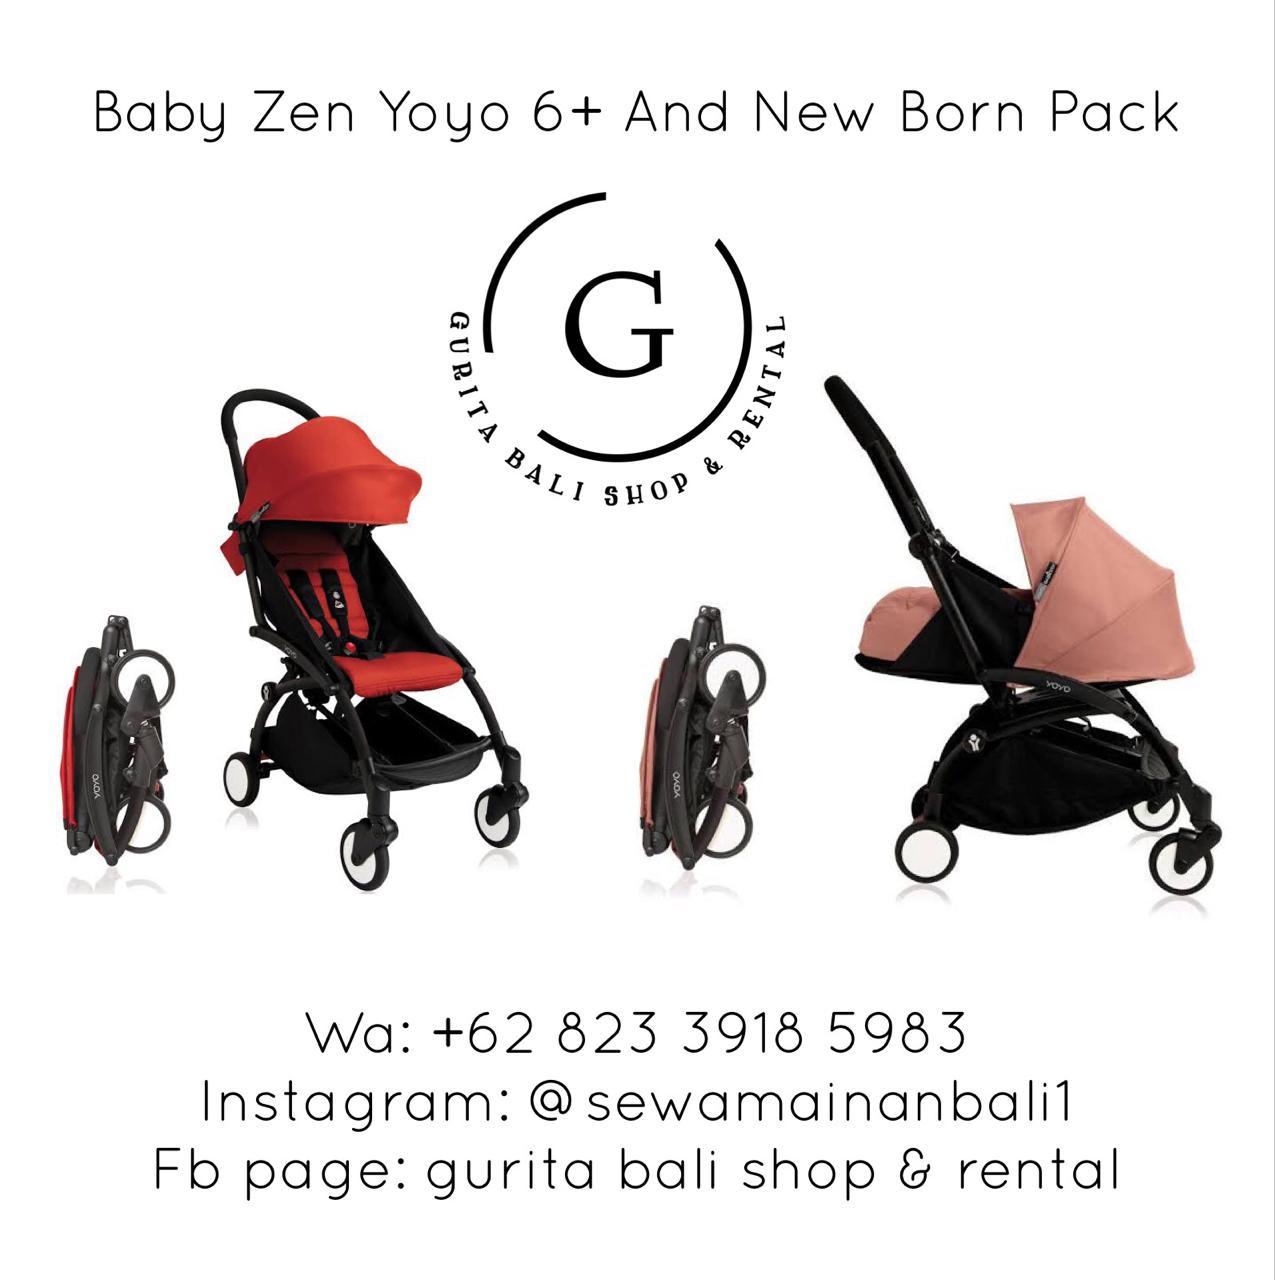 BABY ZEN YOYO 6+ OR NEW BORN